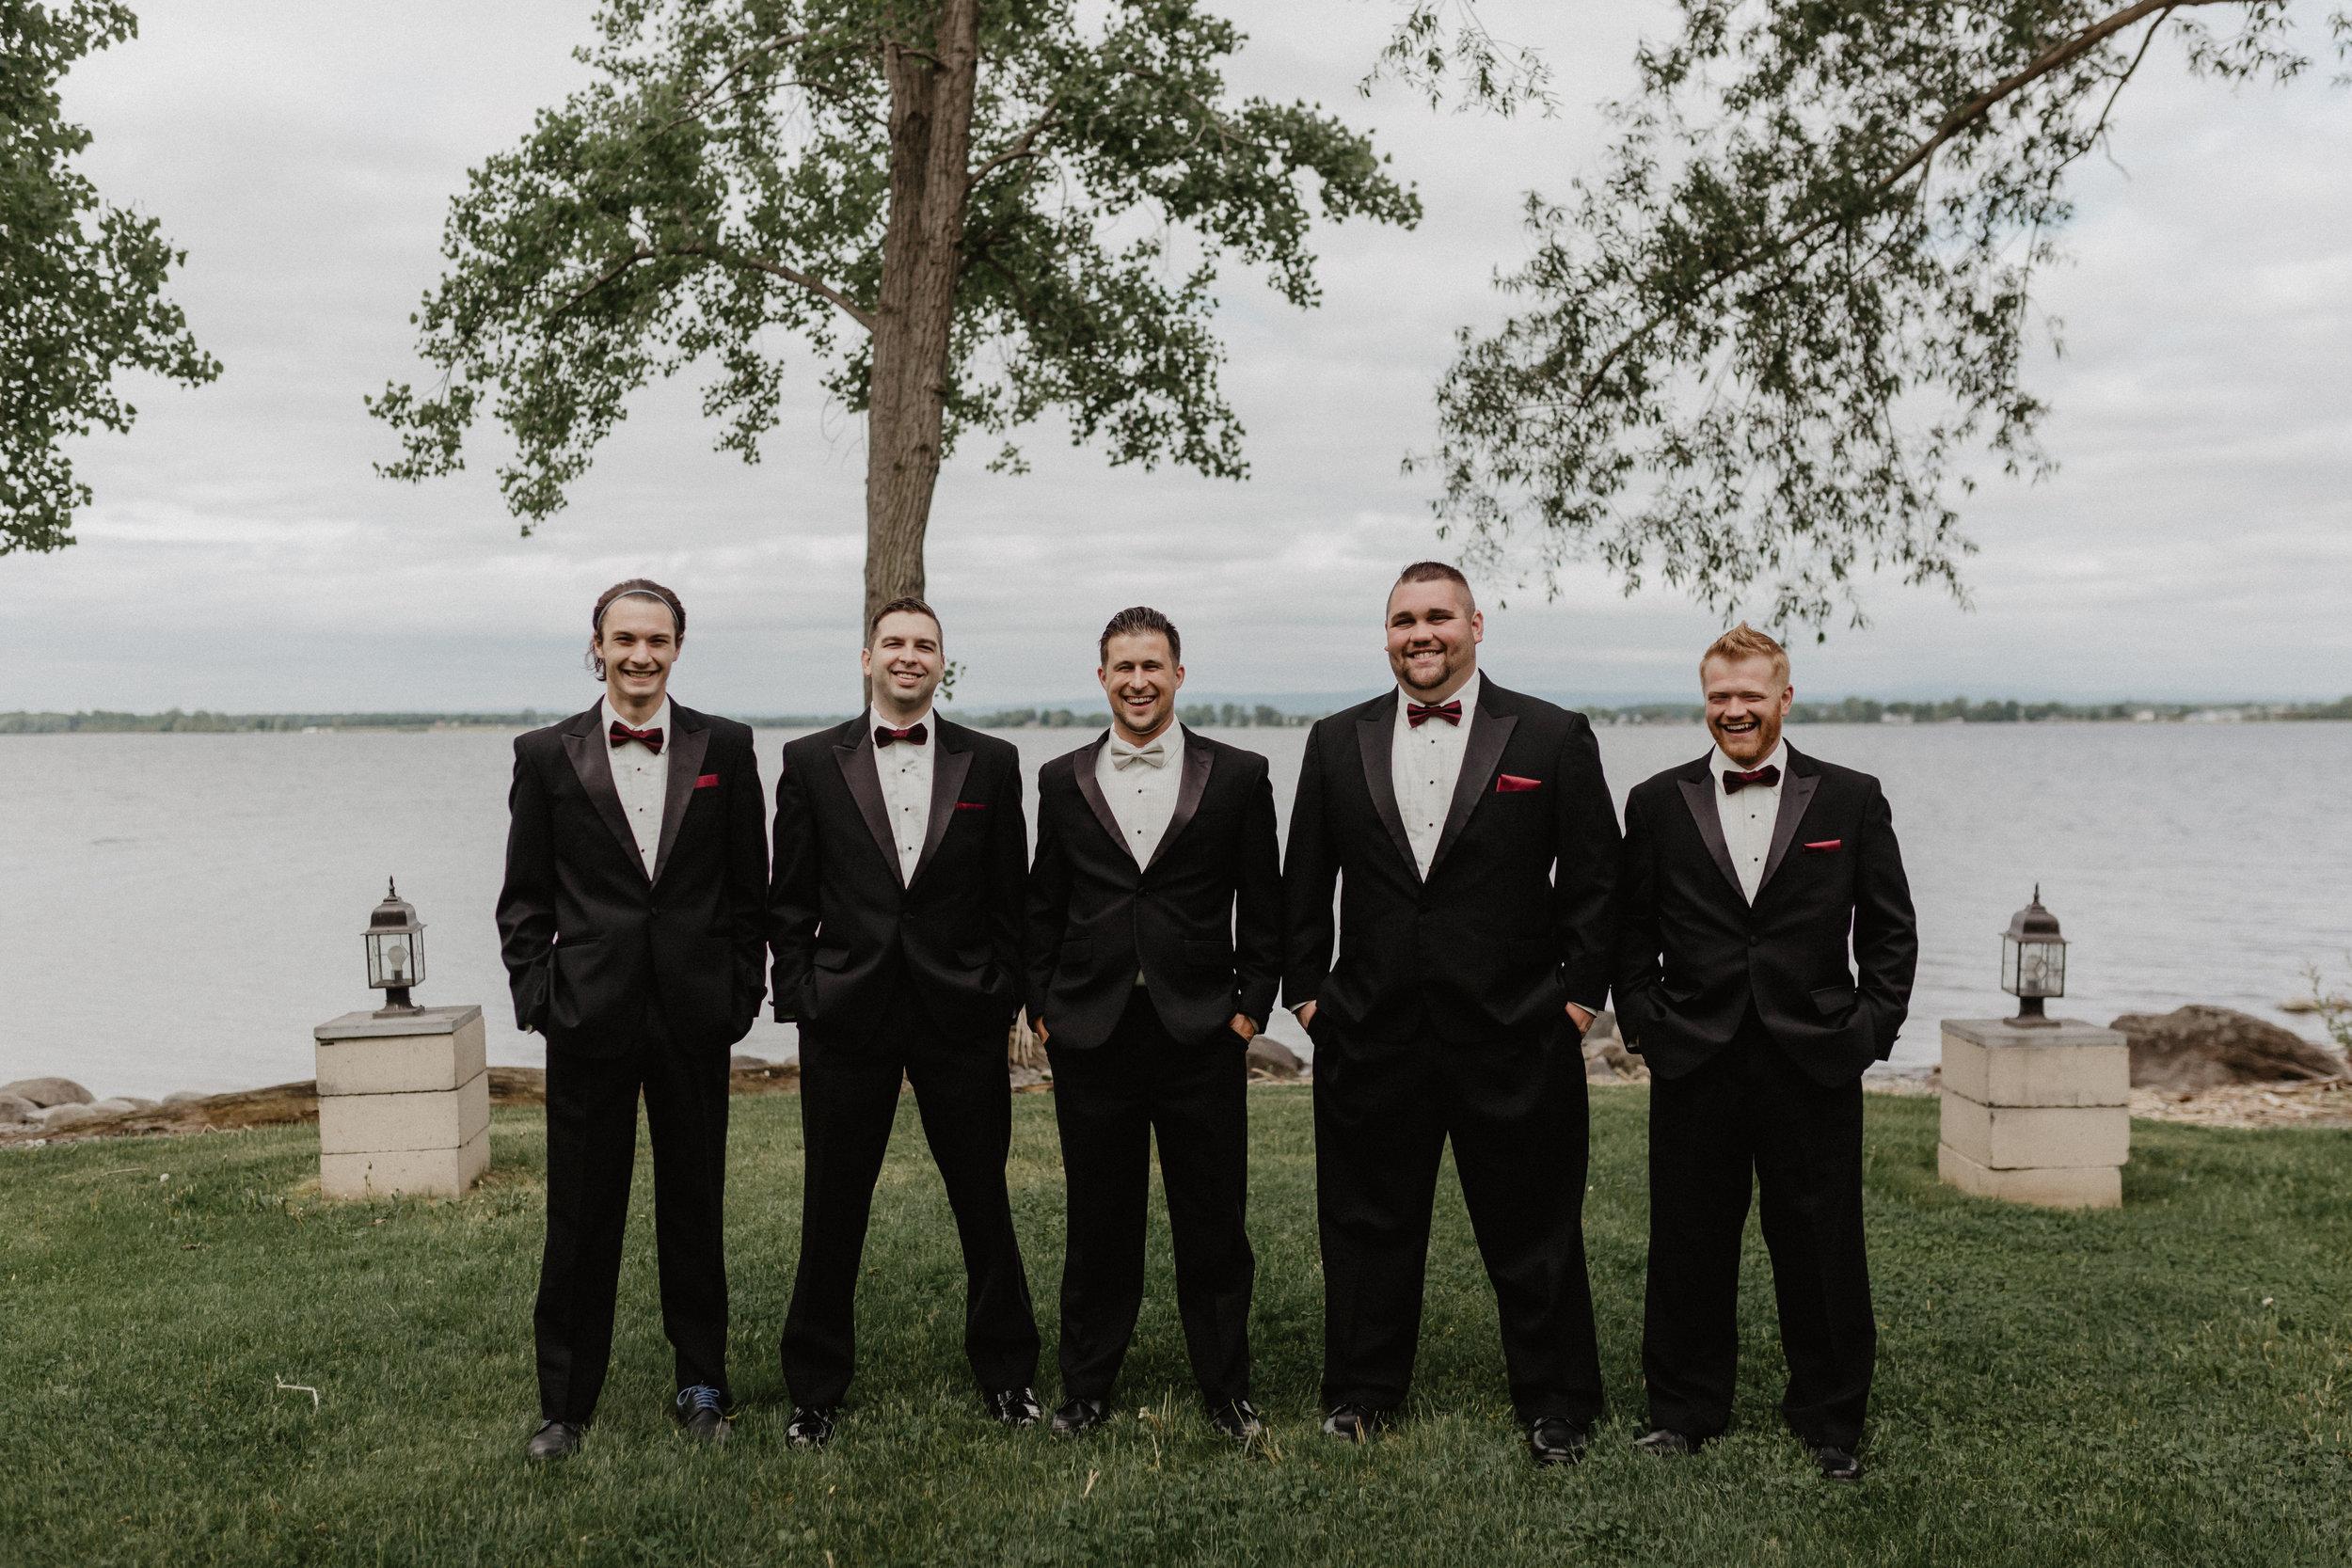 upstate_ny_wedding-8.jpg